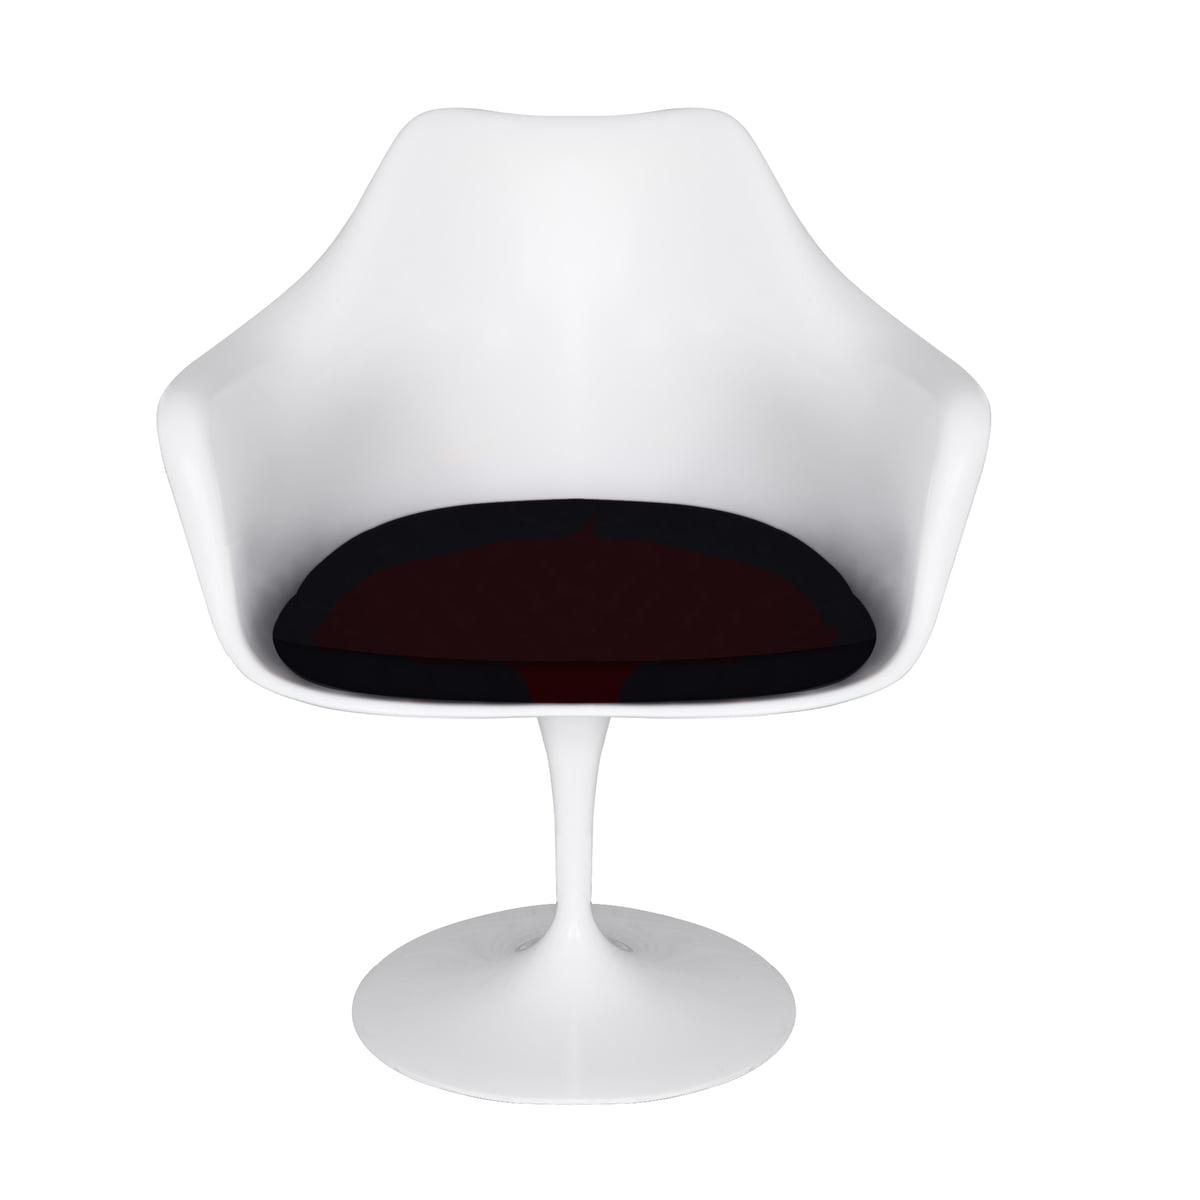 Knoll Saarinen Tulip Armchair Rotating White Cushion Tonus Black 128